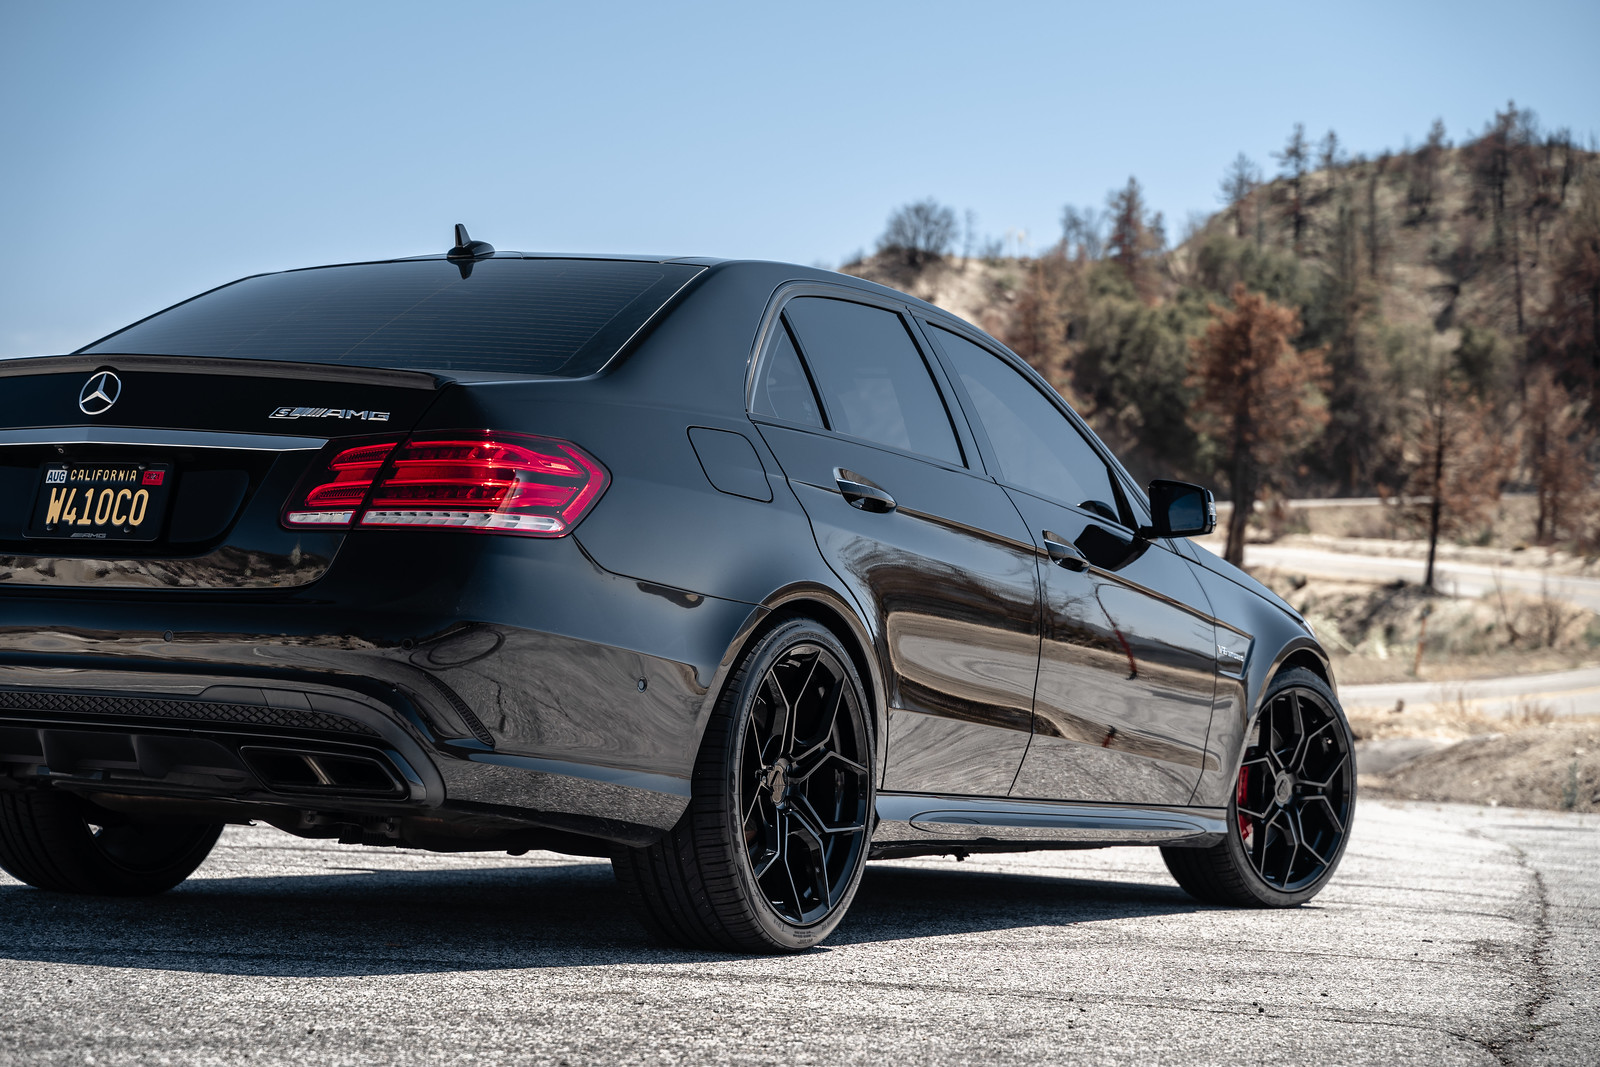 2016_Mercedes_Benz_E63_S_AMG_BDF25_Gloss_Black_1